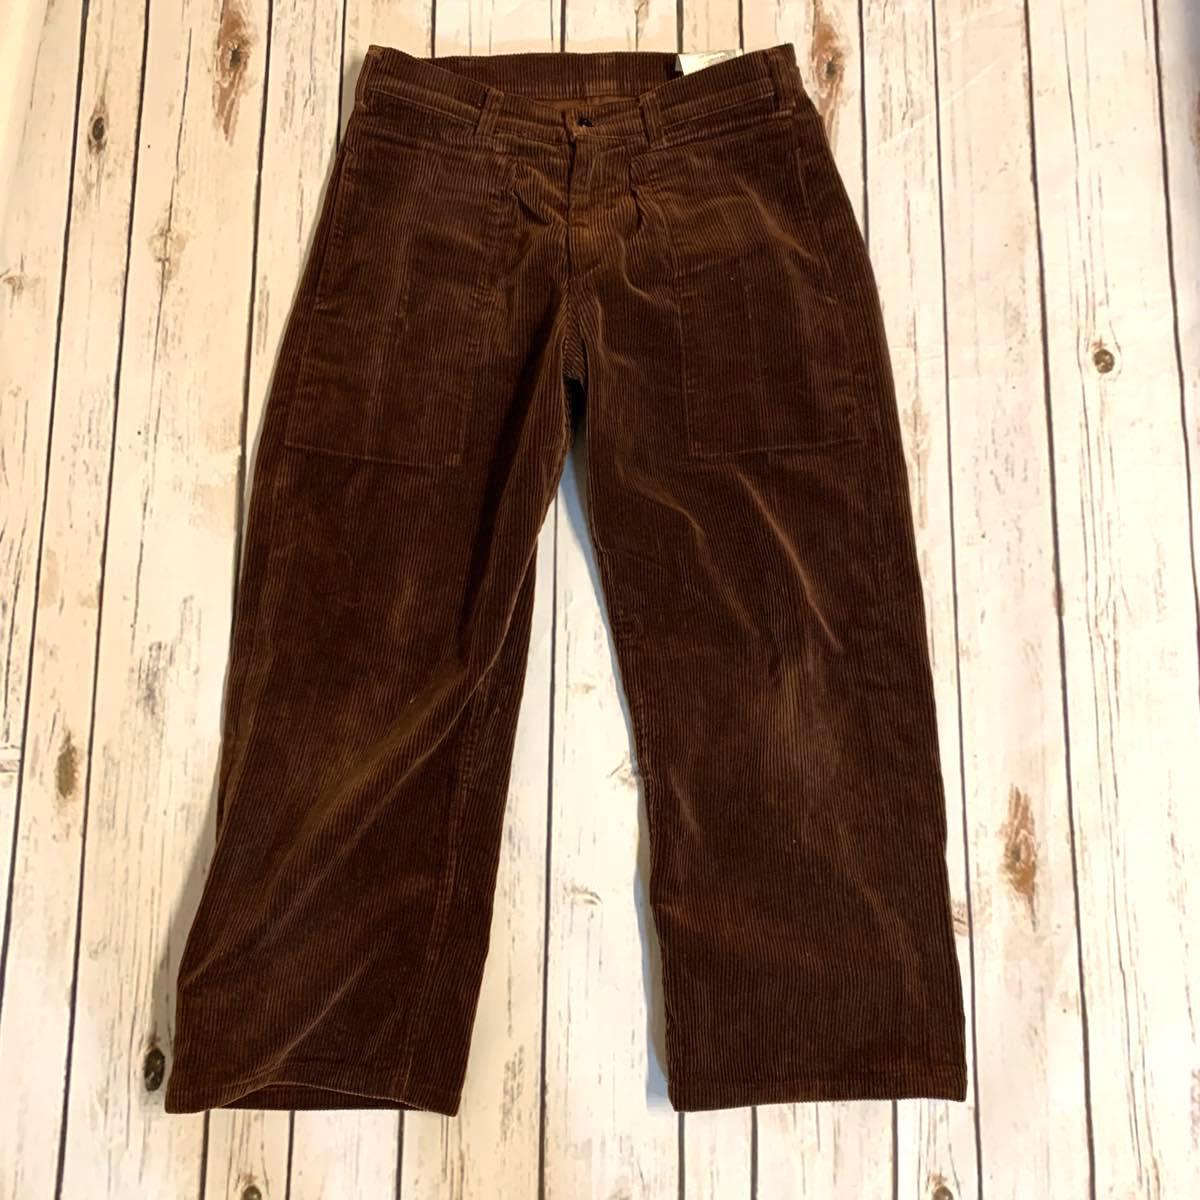 TUKI (ツキ) 0086 PACHED WORK PANTS (8 WALE CORDUROY) BROWN UNISEX